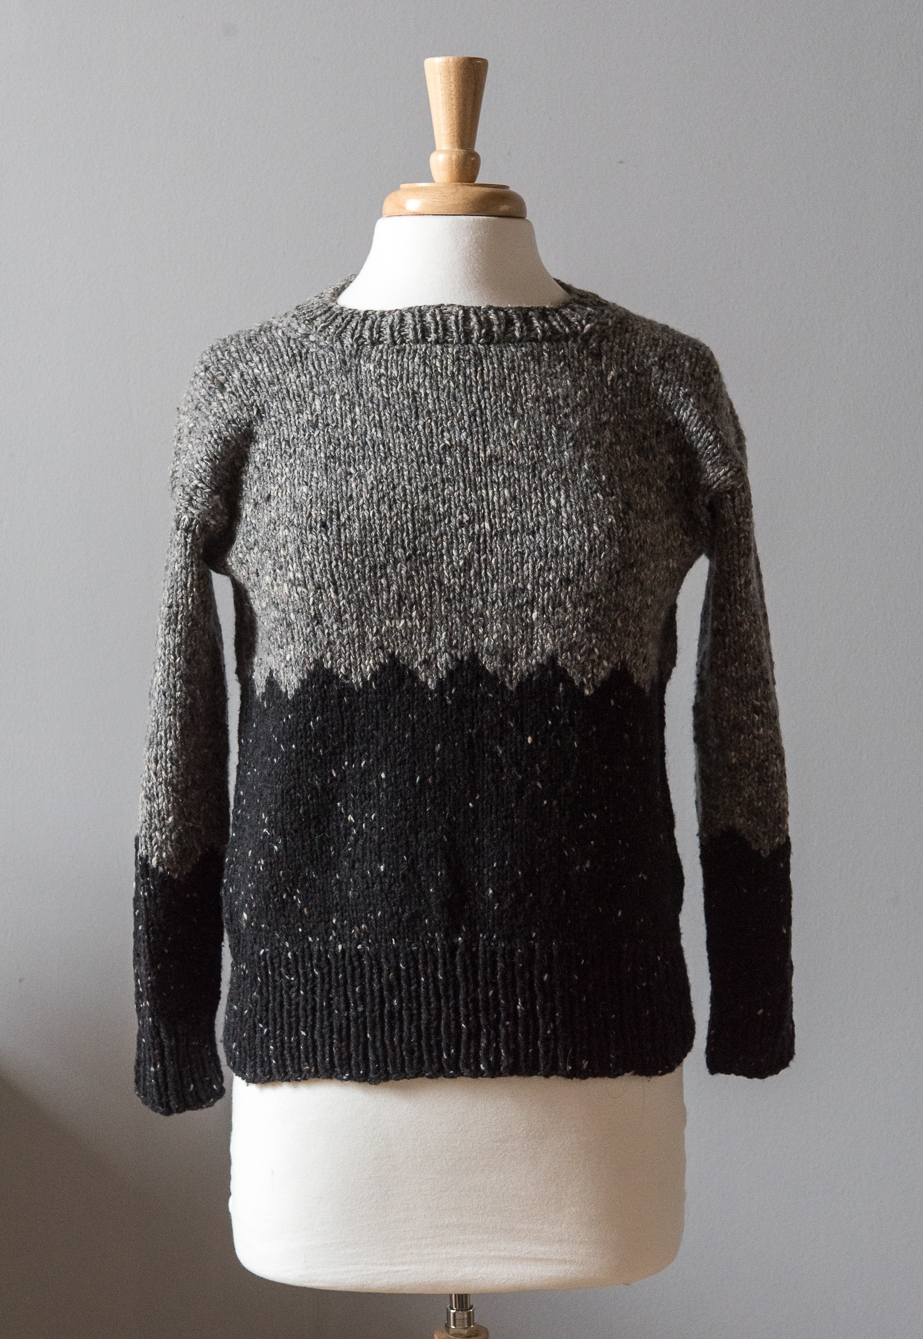 The Fibre Co. Arranmore, wild atlantic way sweater